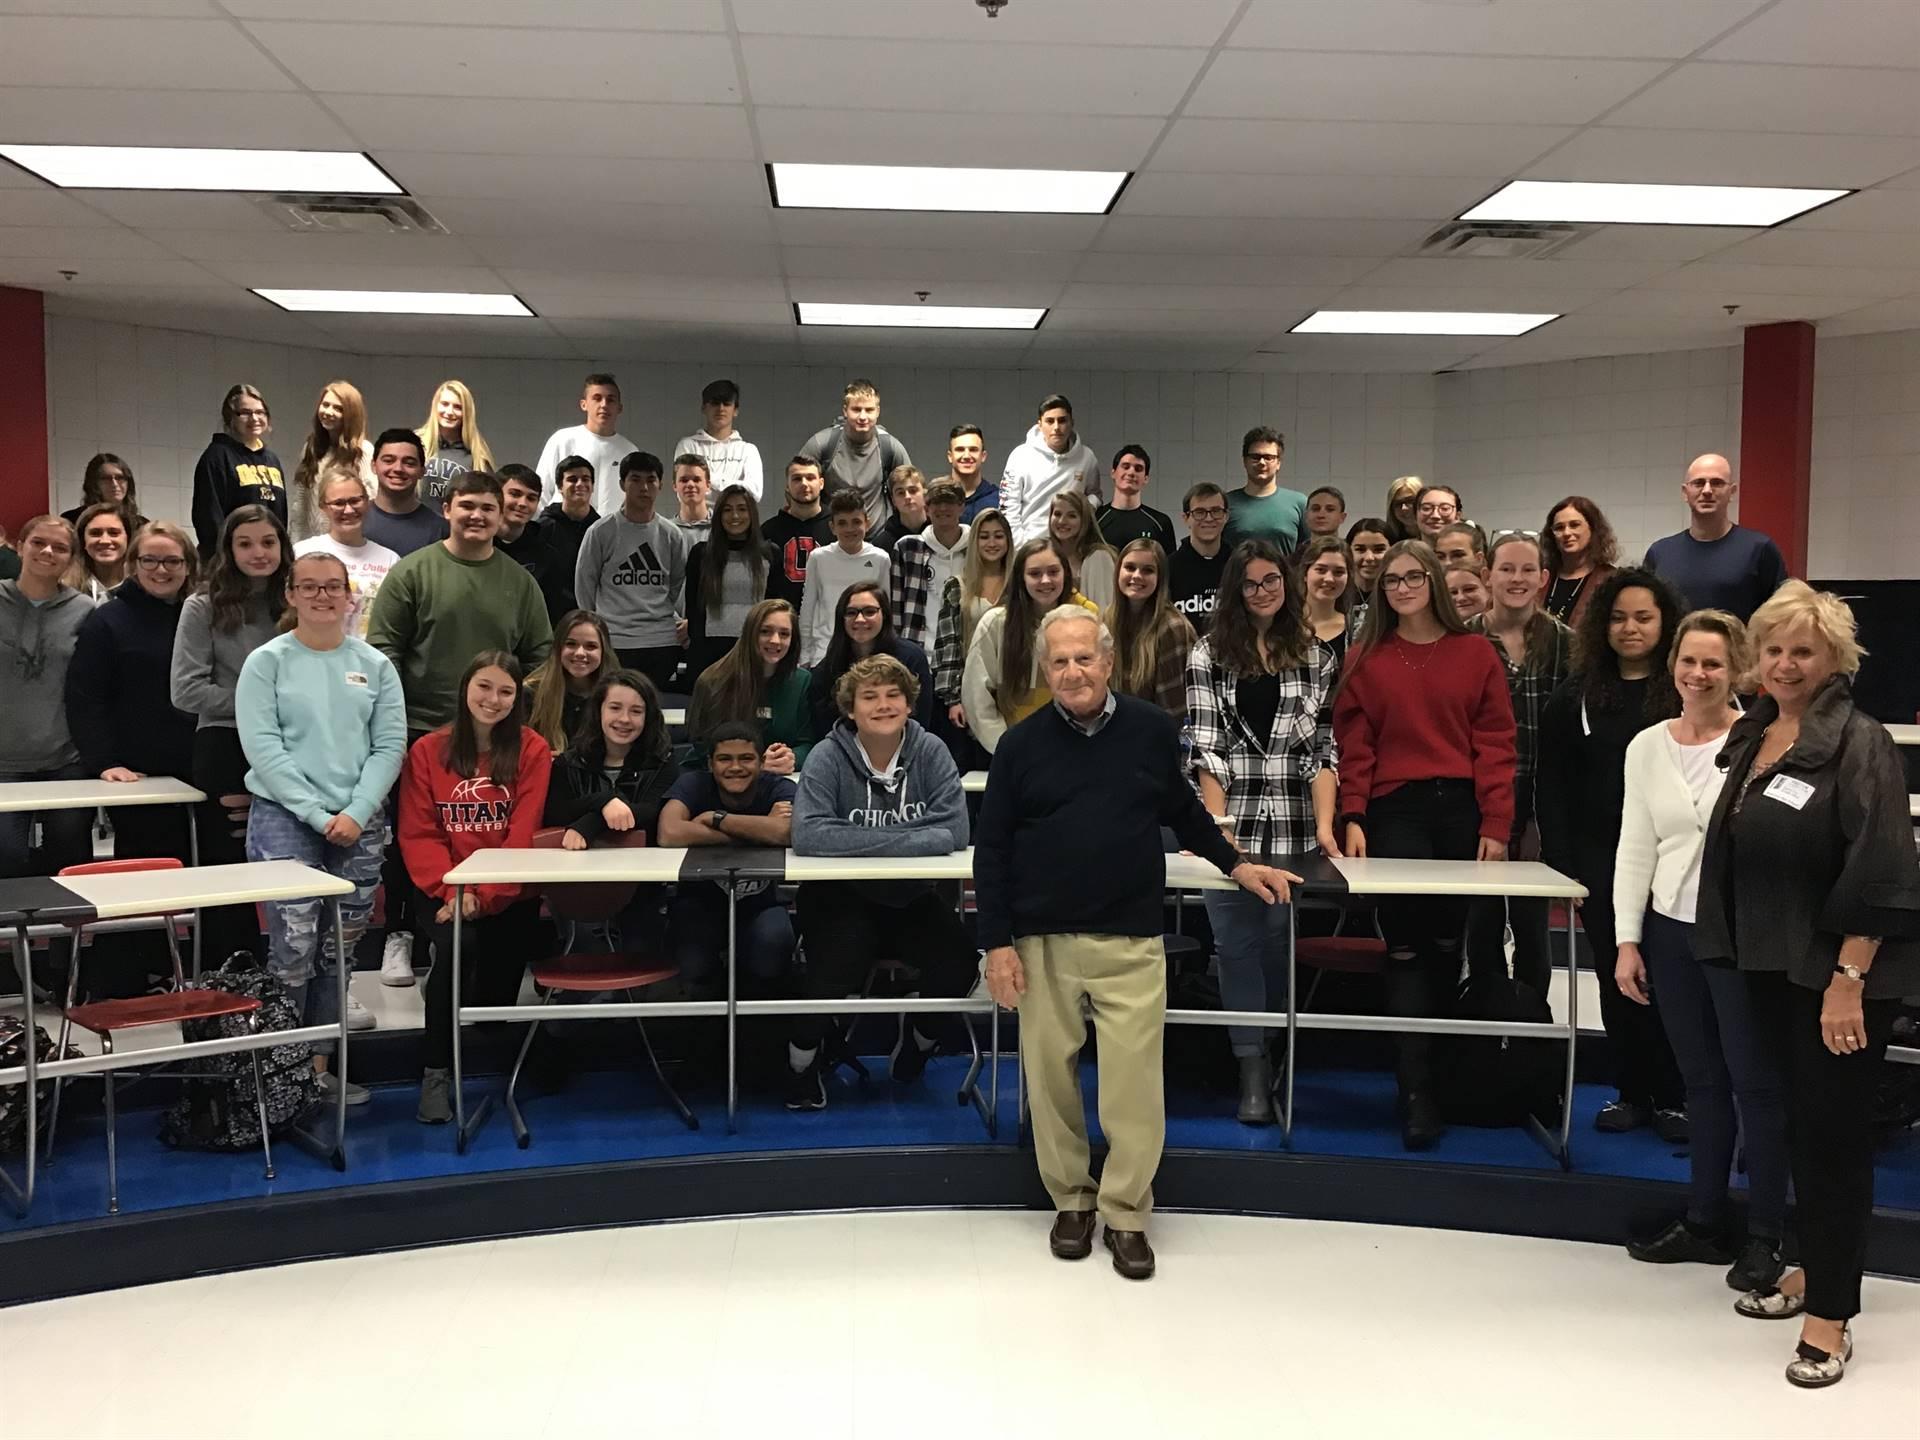 Mr. Frank Grunwald, a Holocaust survivor, shared his story with SAHS students